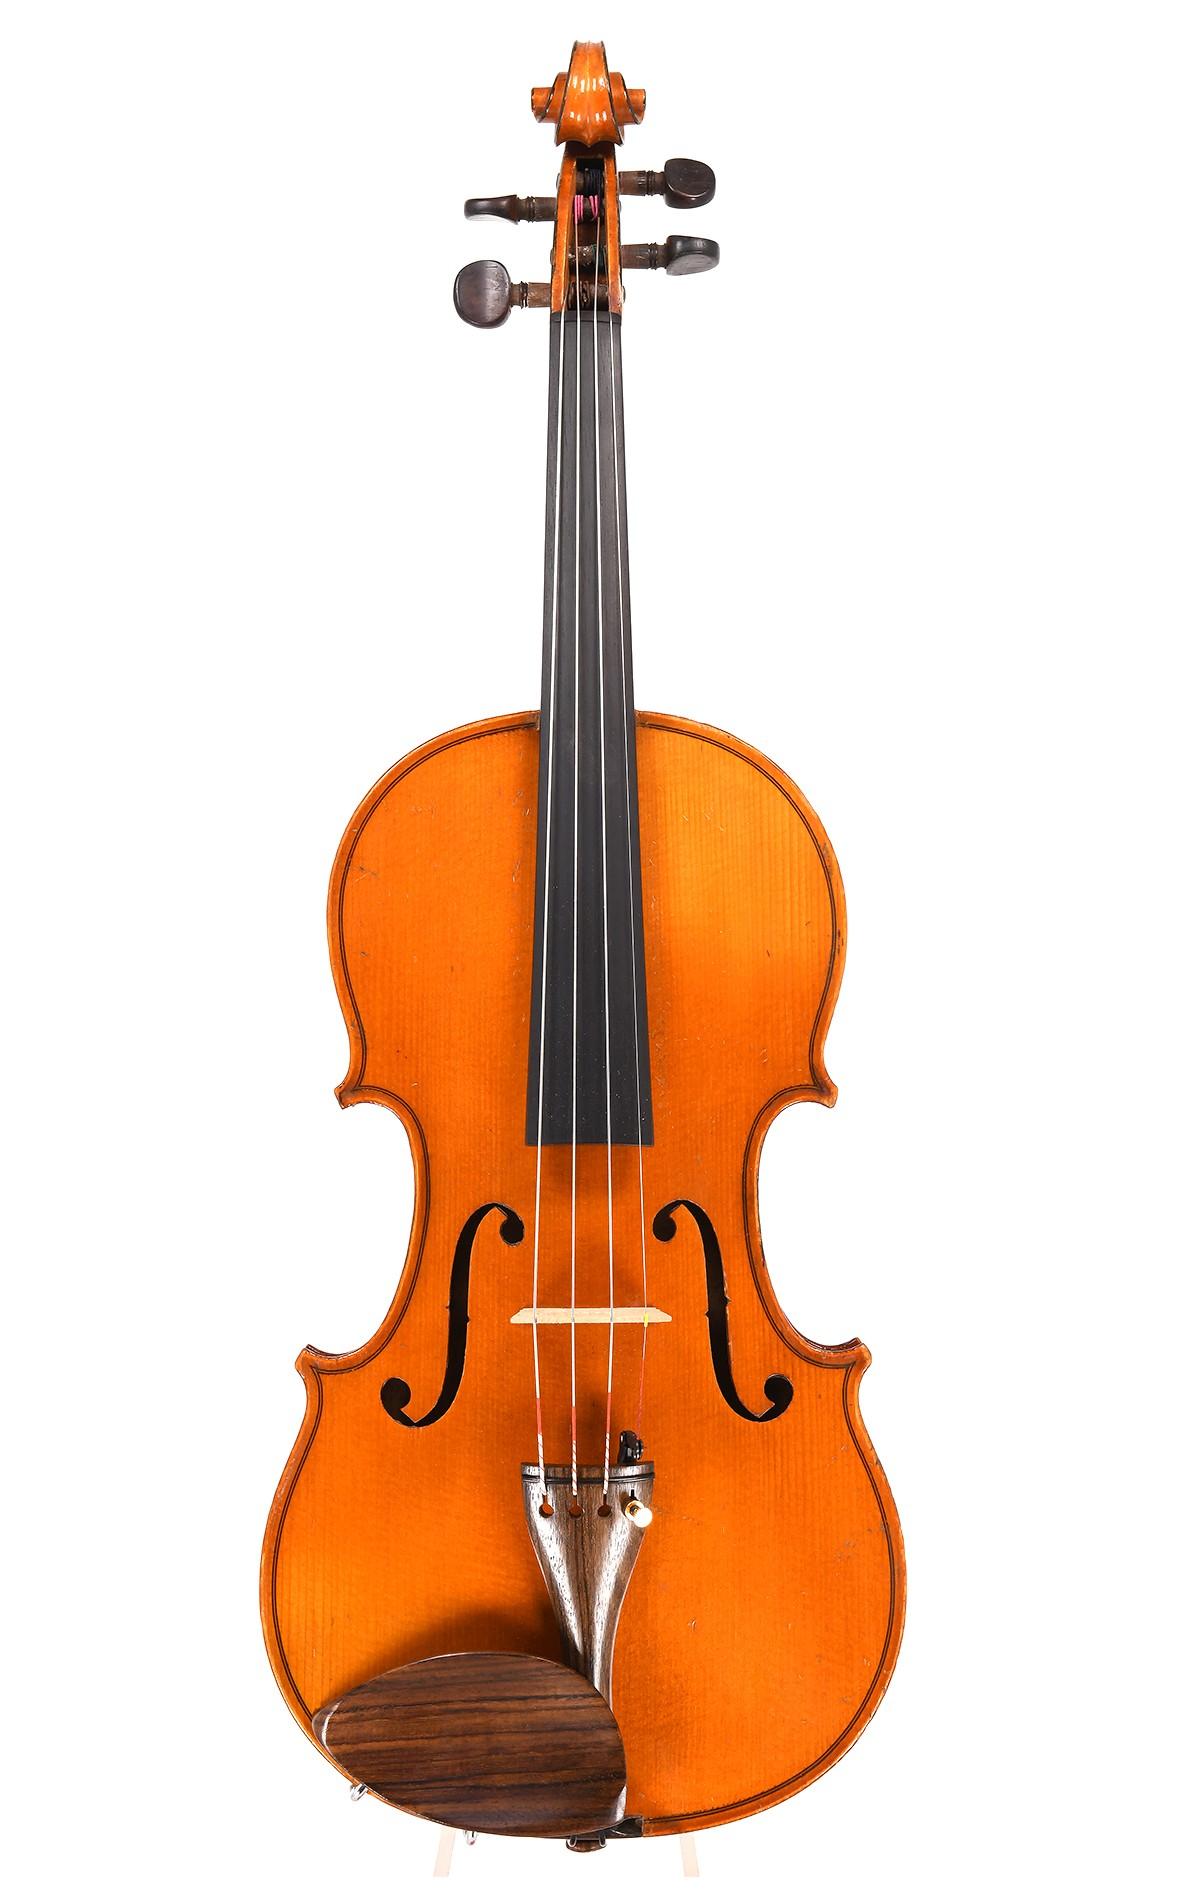 Acoulon Blondelet Violine aus Mirecourt